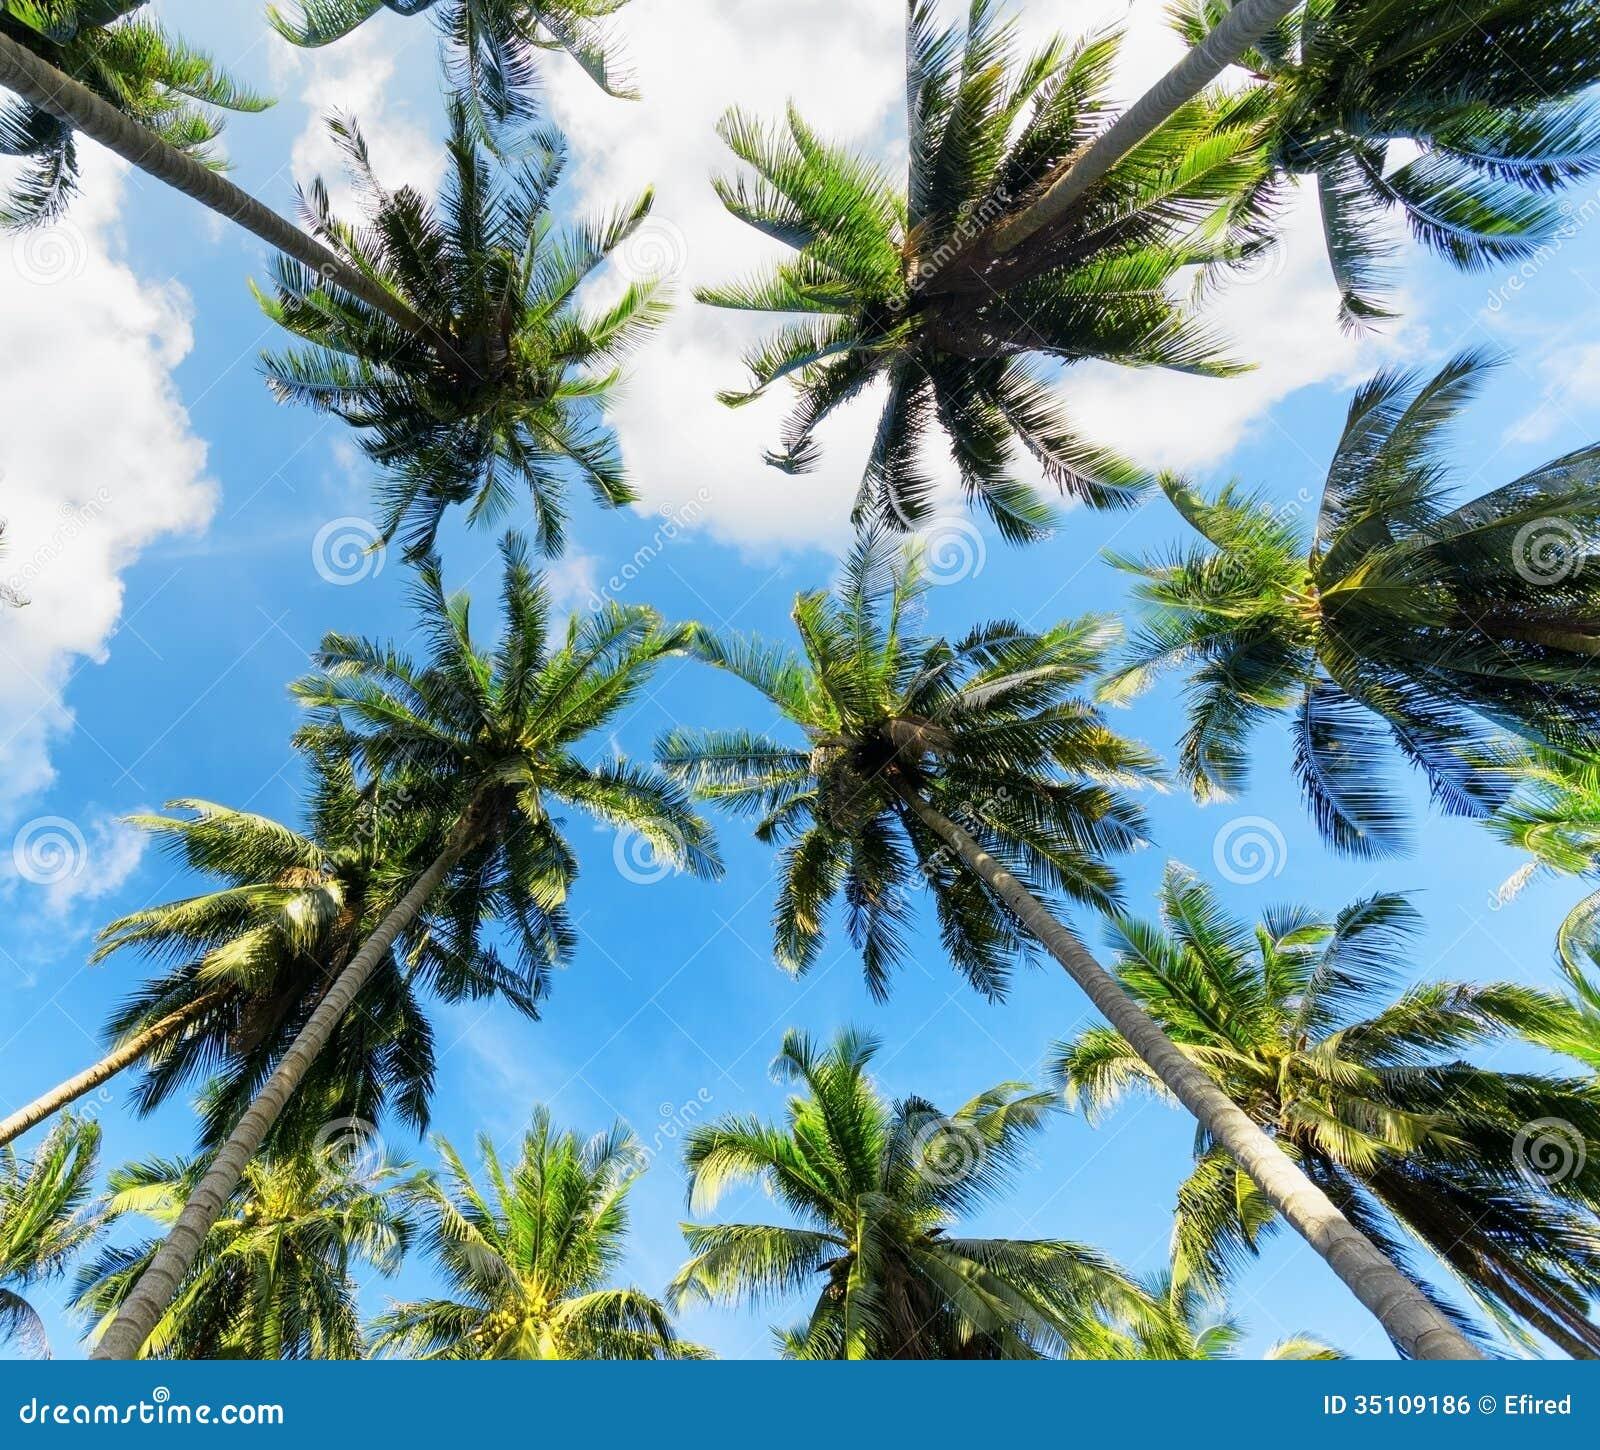 trees palm blue - photo #20